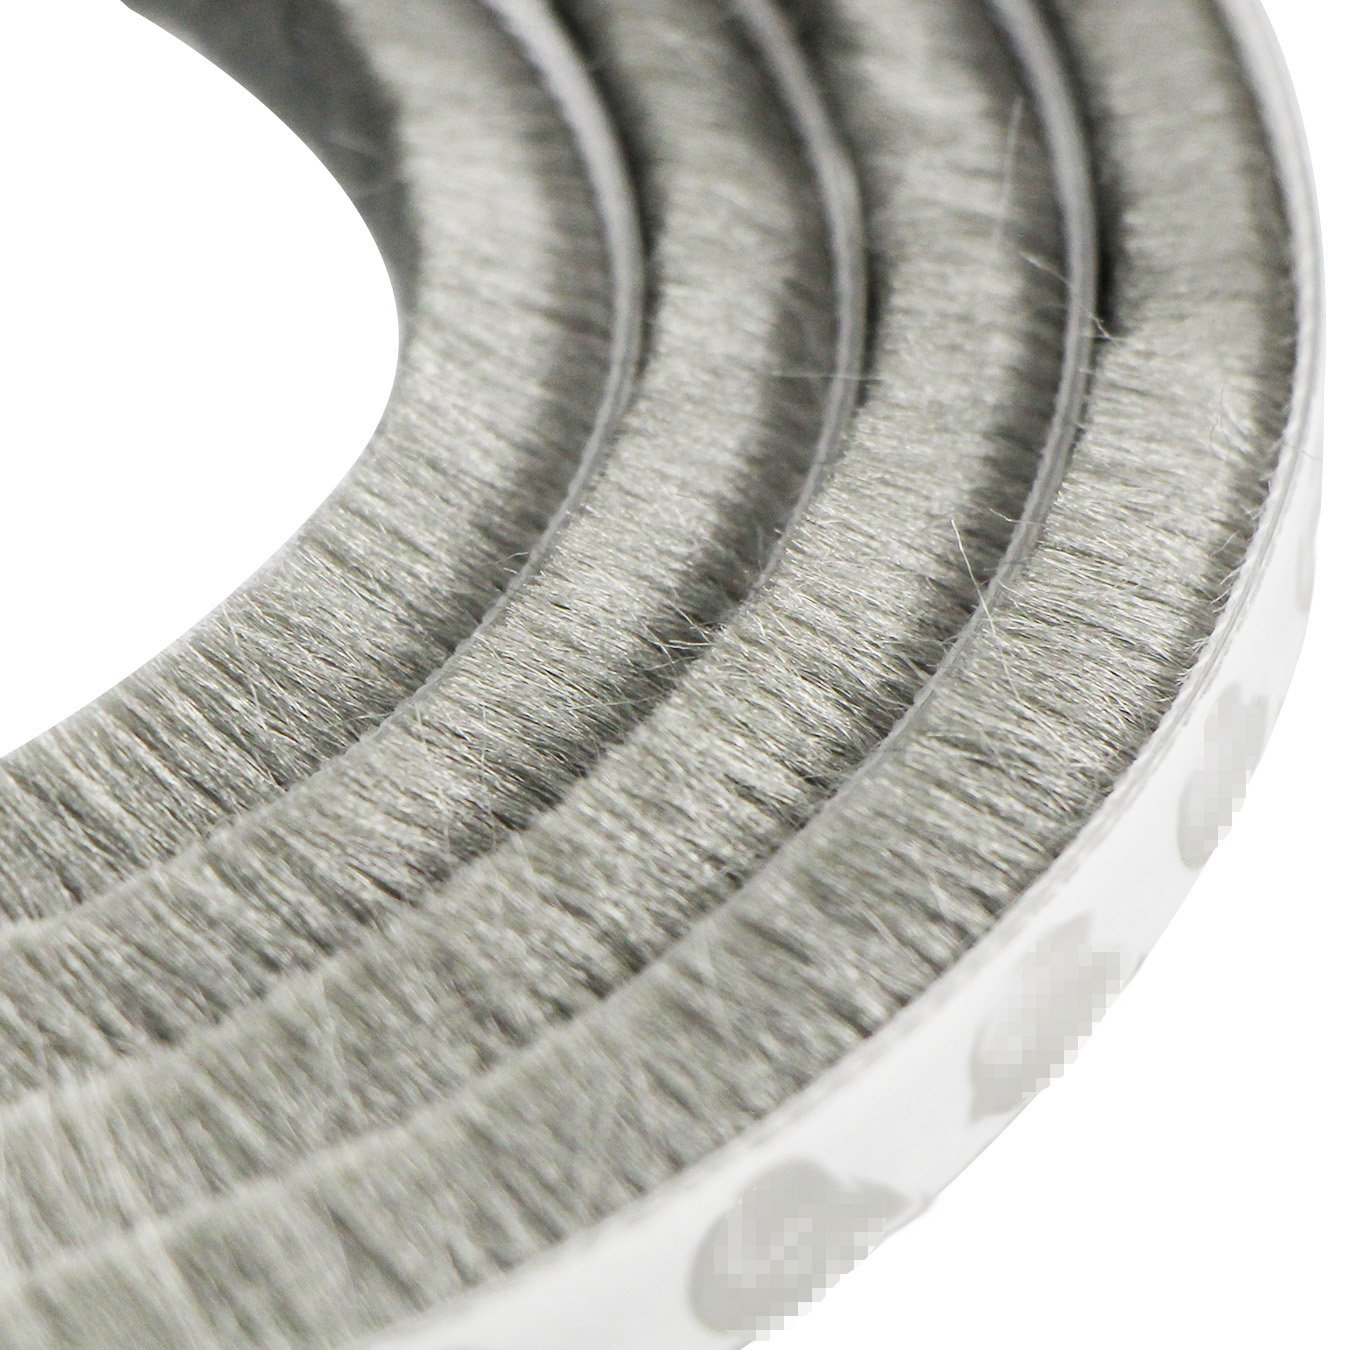 for gaps 7.5-13 mm Pile Height: 15mm UOOOM 10 m a Prueba de Viento de Polvo Puerta Ventana Strip Pegatina de Sellado Cepillo Strip , Marr/ón